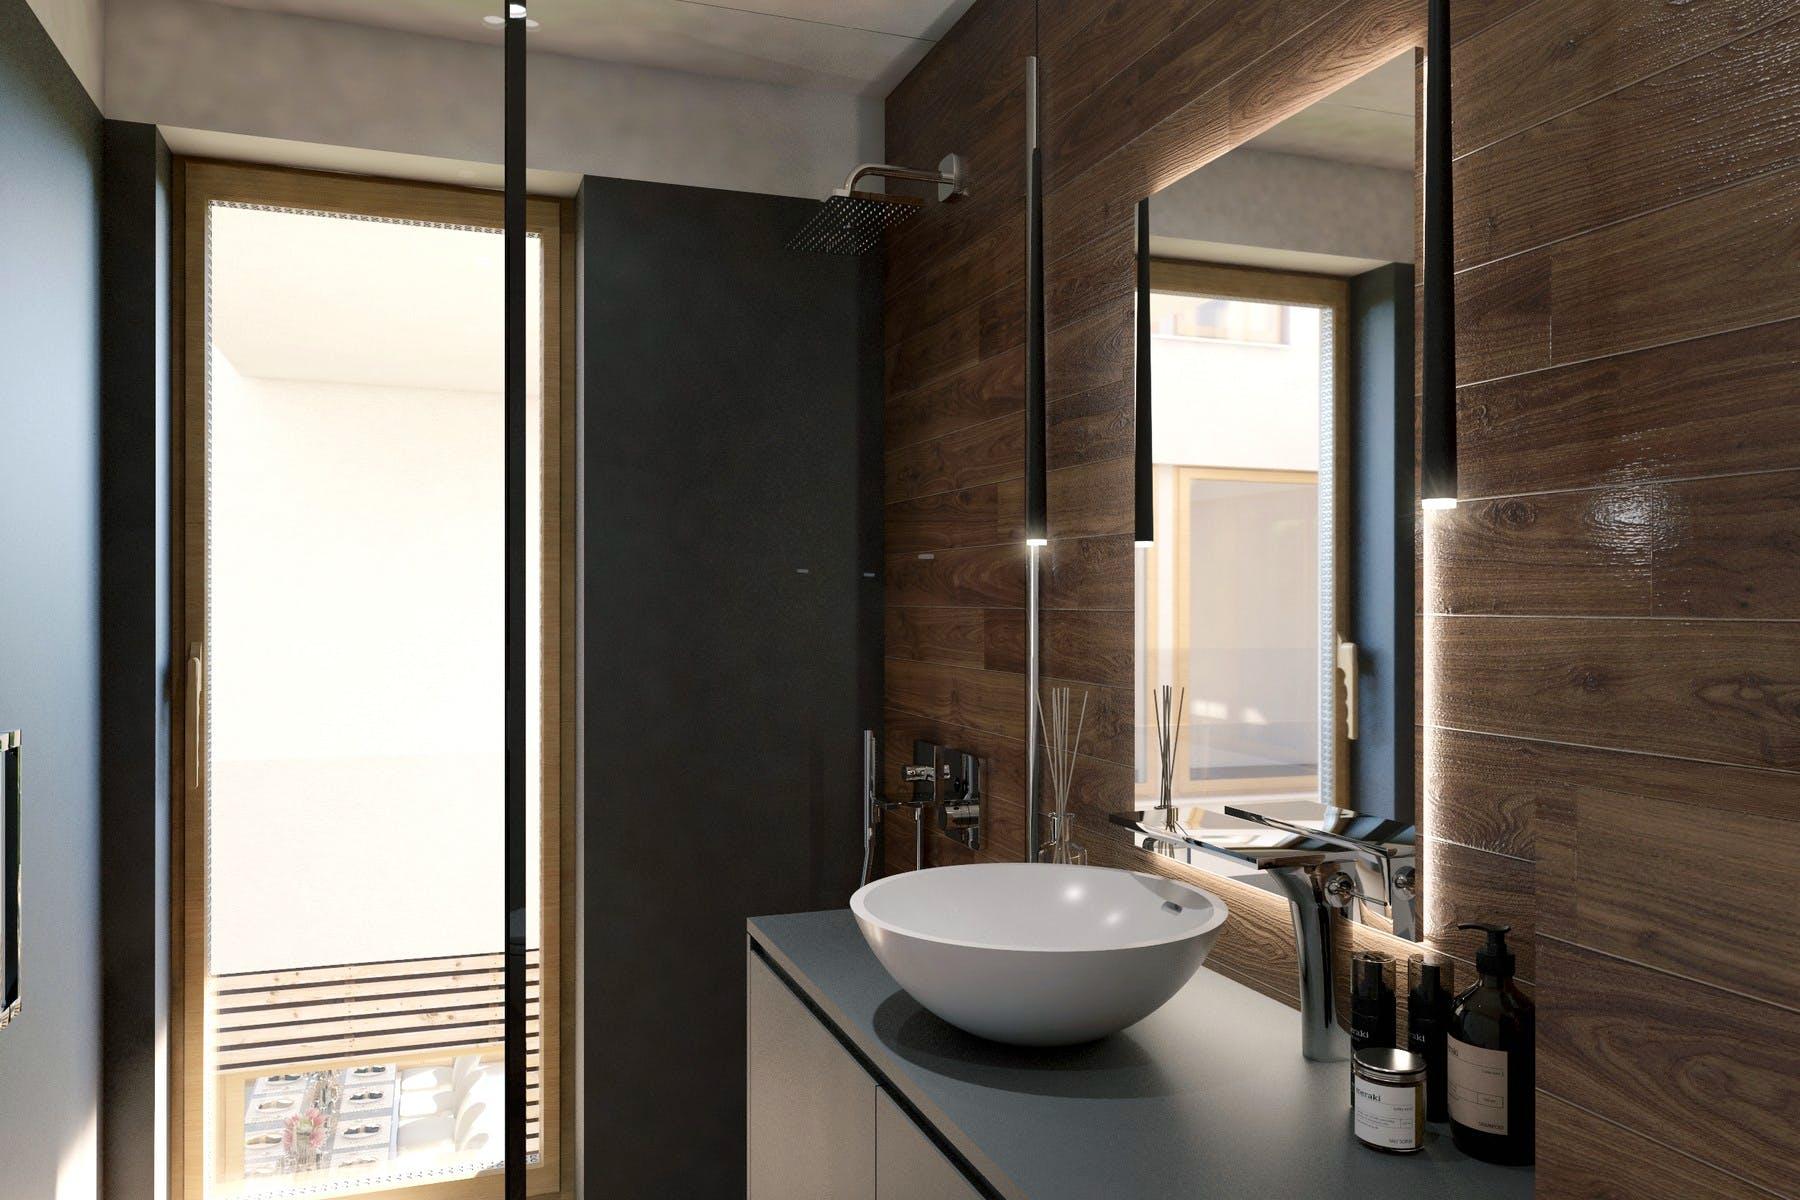 Moderni dizajn kupaonice